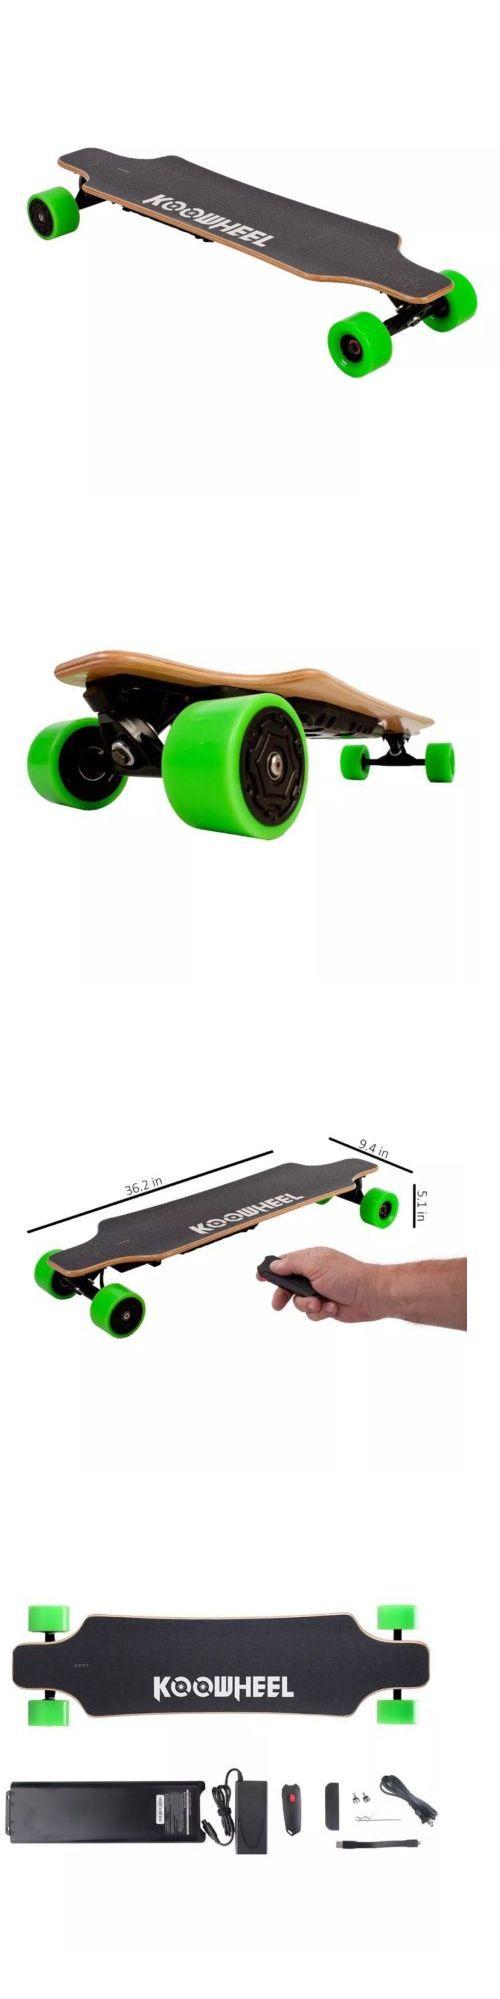 Skateboards-Complete 16264: Koowheel Electric Skateboard Dual Motor Boosted Board Wireless Remote Control -> BUY IT NOW ONLY: $539.99 on eBay!